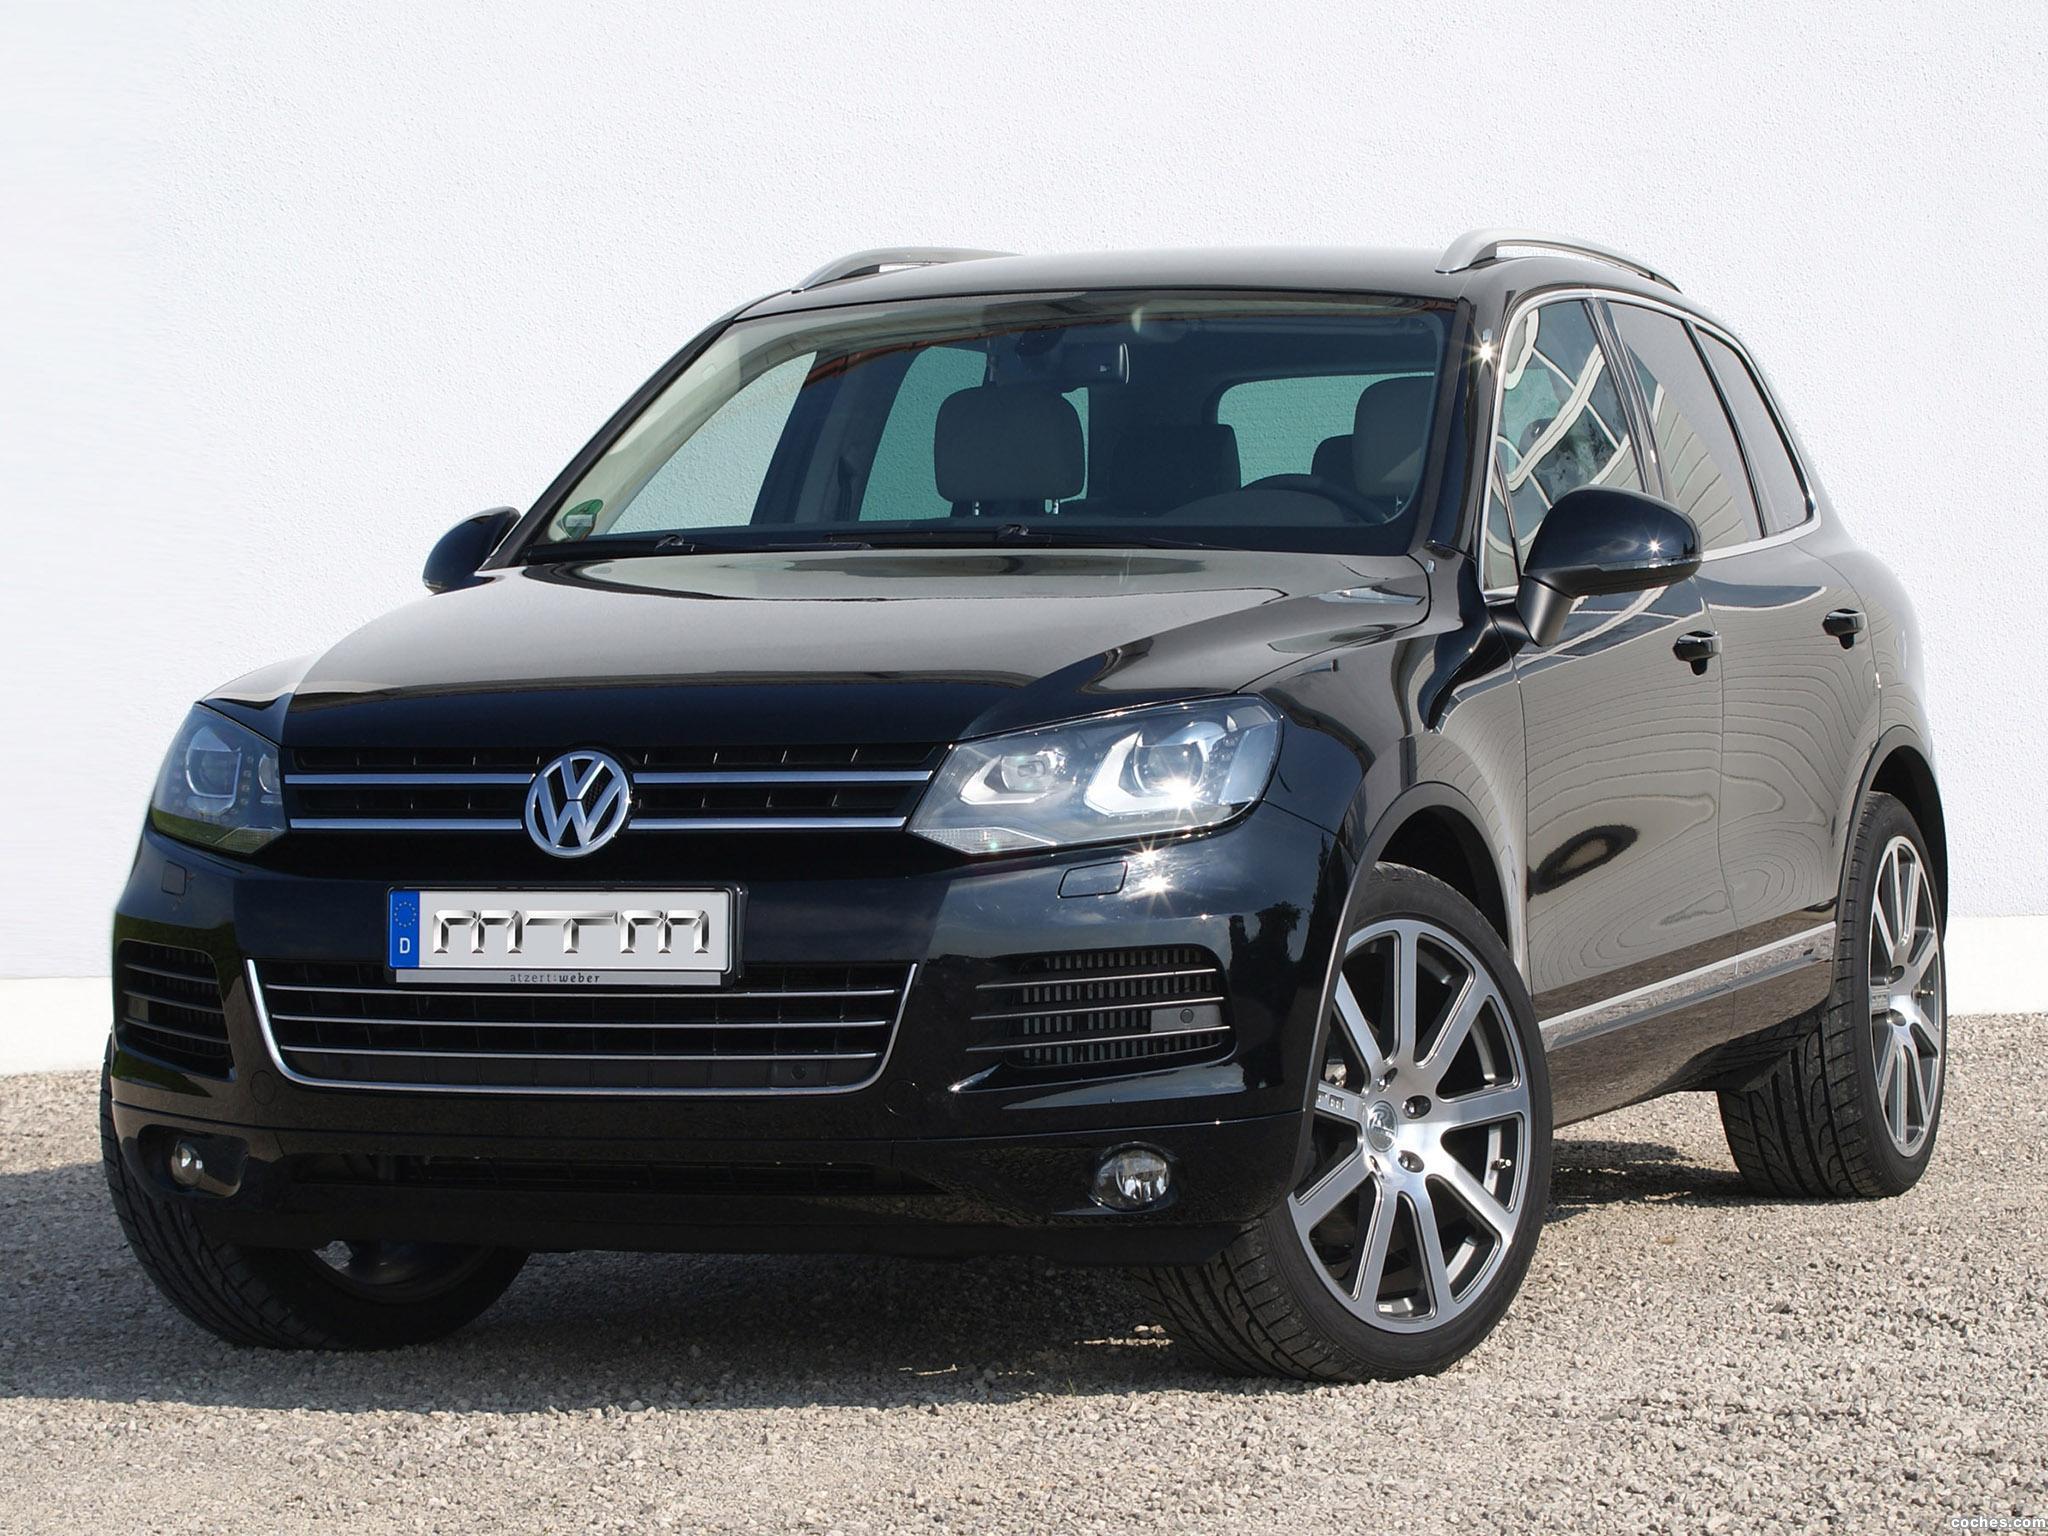 Foto 0 de MTM Volkswagen Touareg TDI 2012